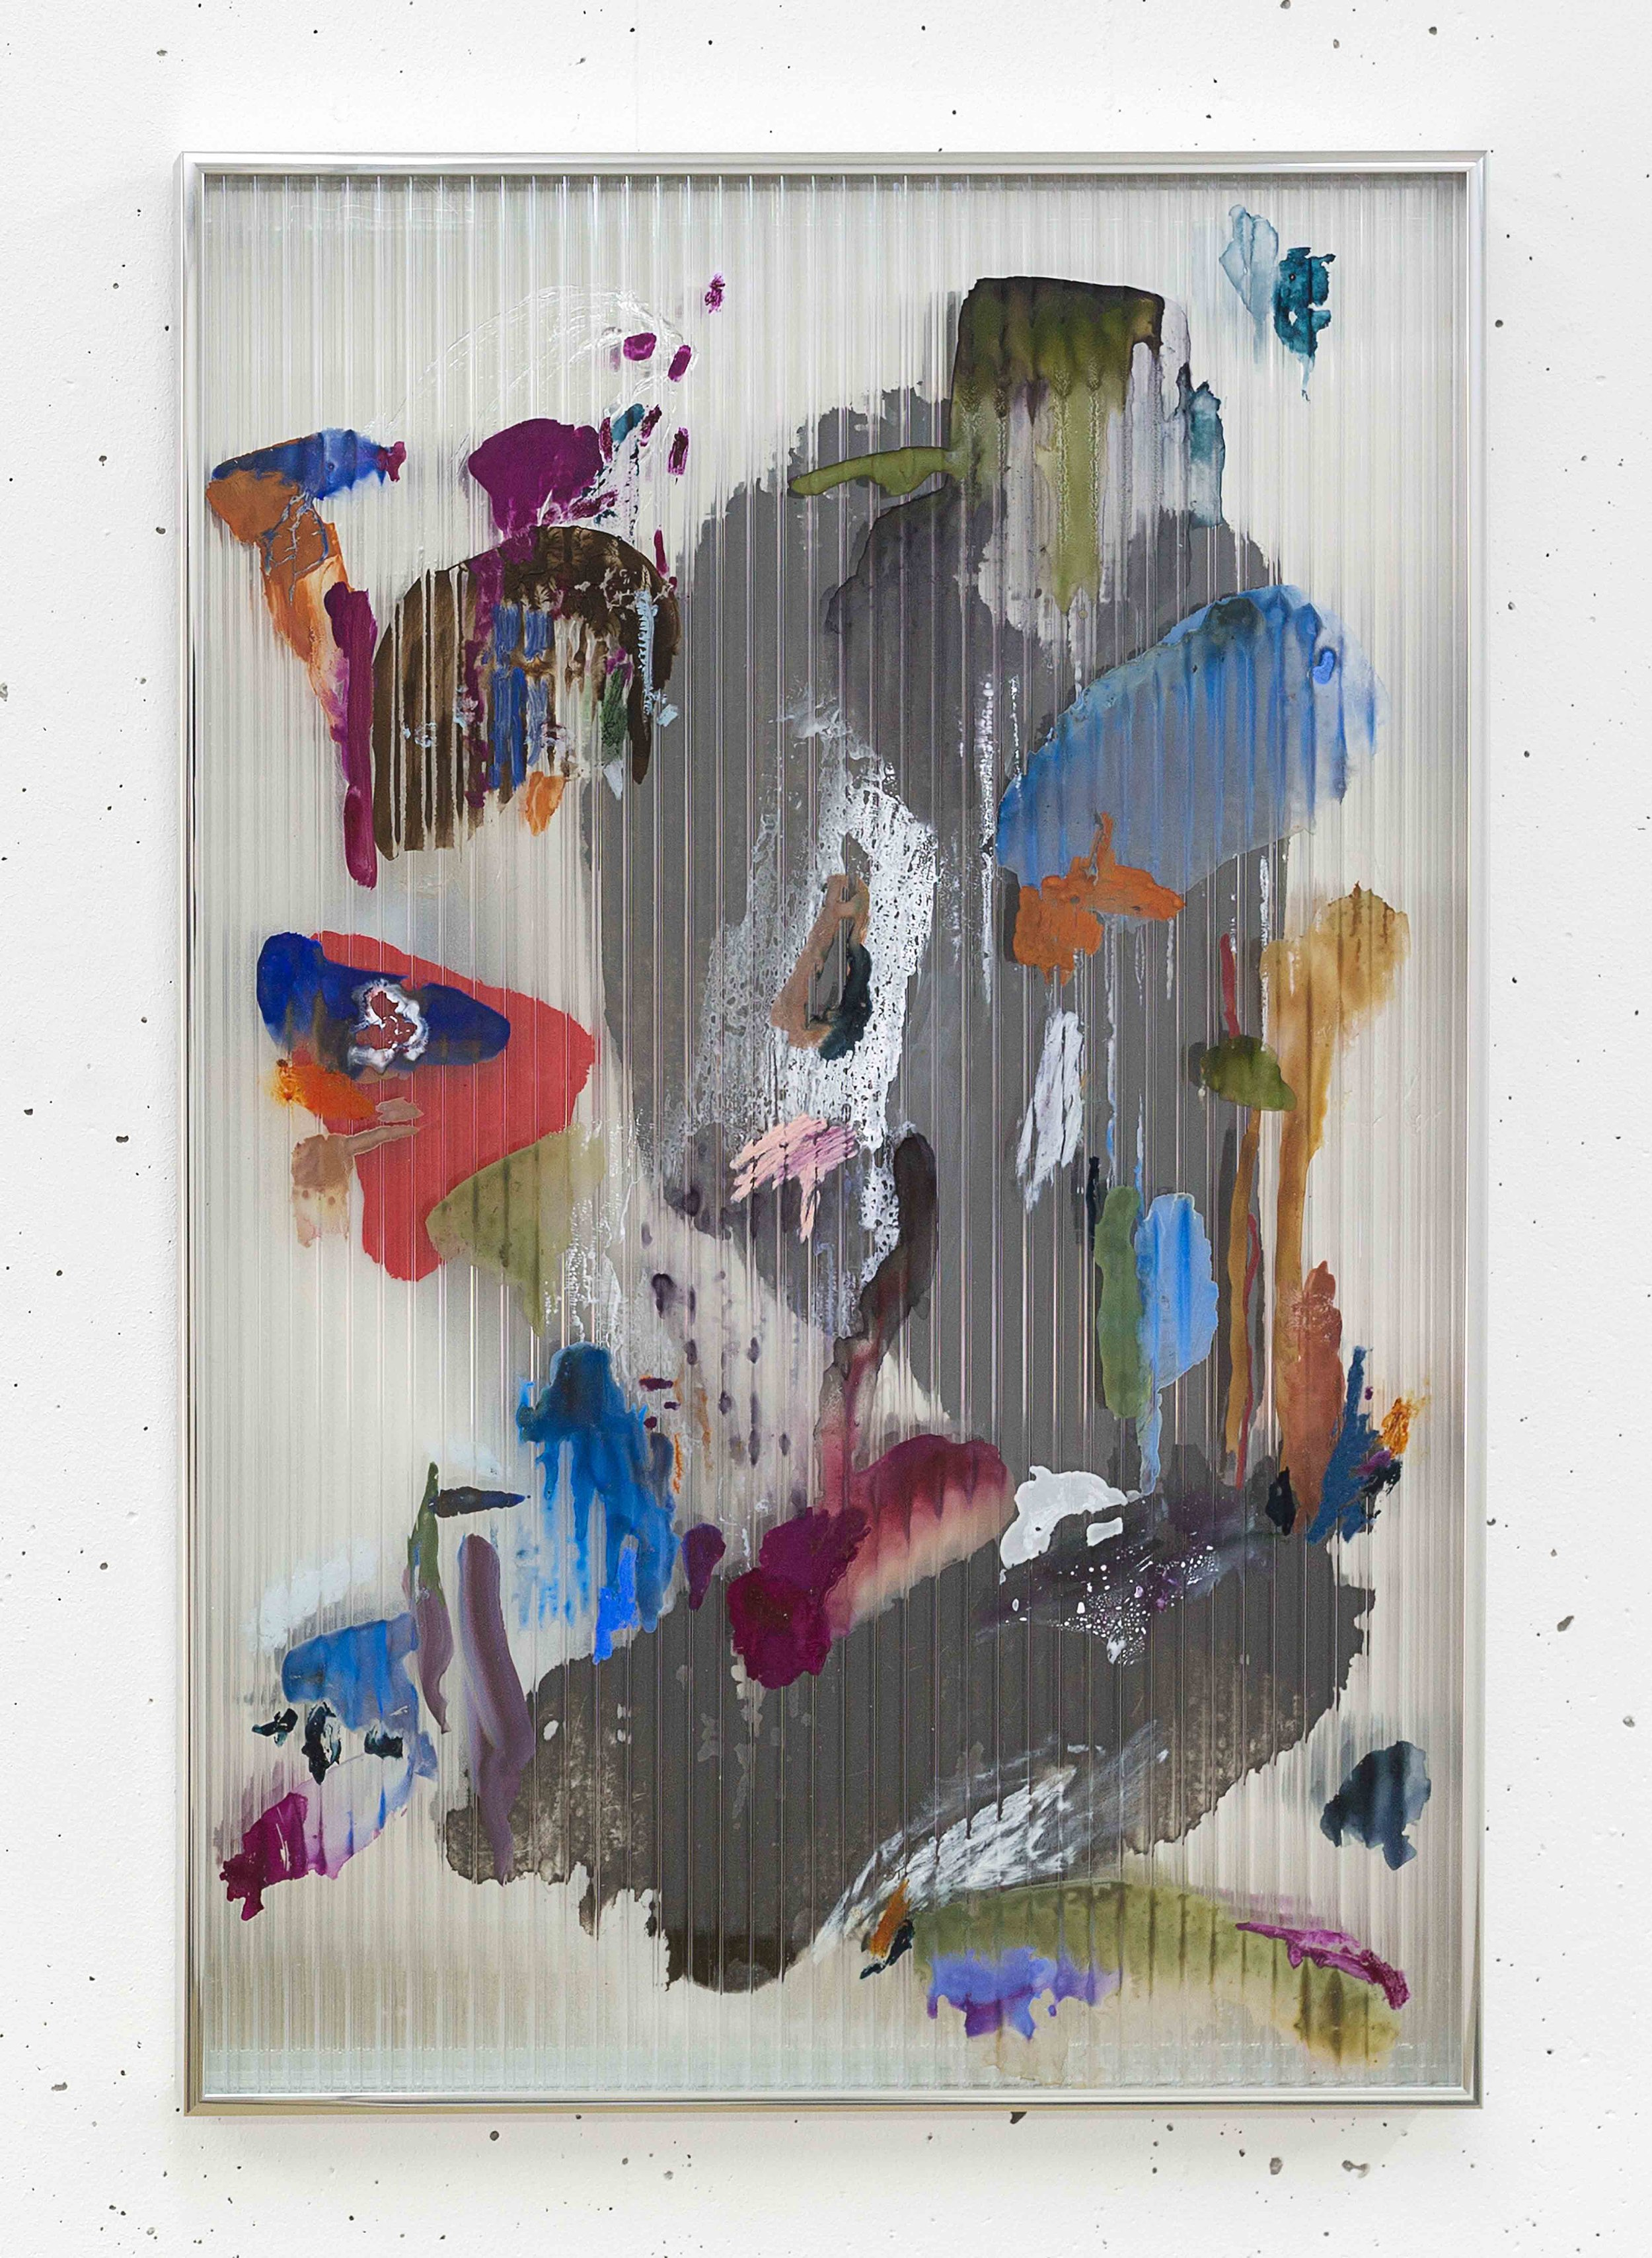 Chaos 1 , 2017 gouache, ink, acrylic, oil, mastic on polycarbonate, mirror, aluminium frame 67 x 44,5 x 2,5 cm  photo © Romain Darnaud